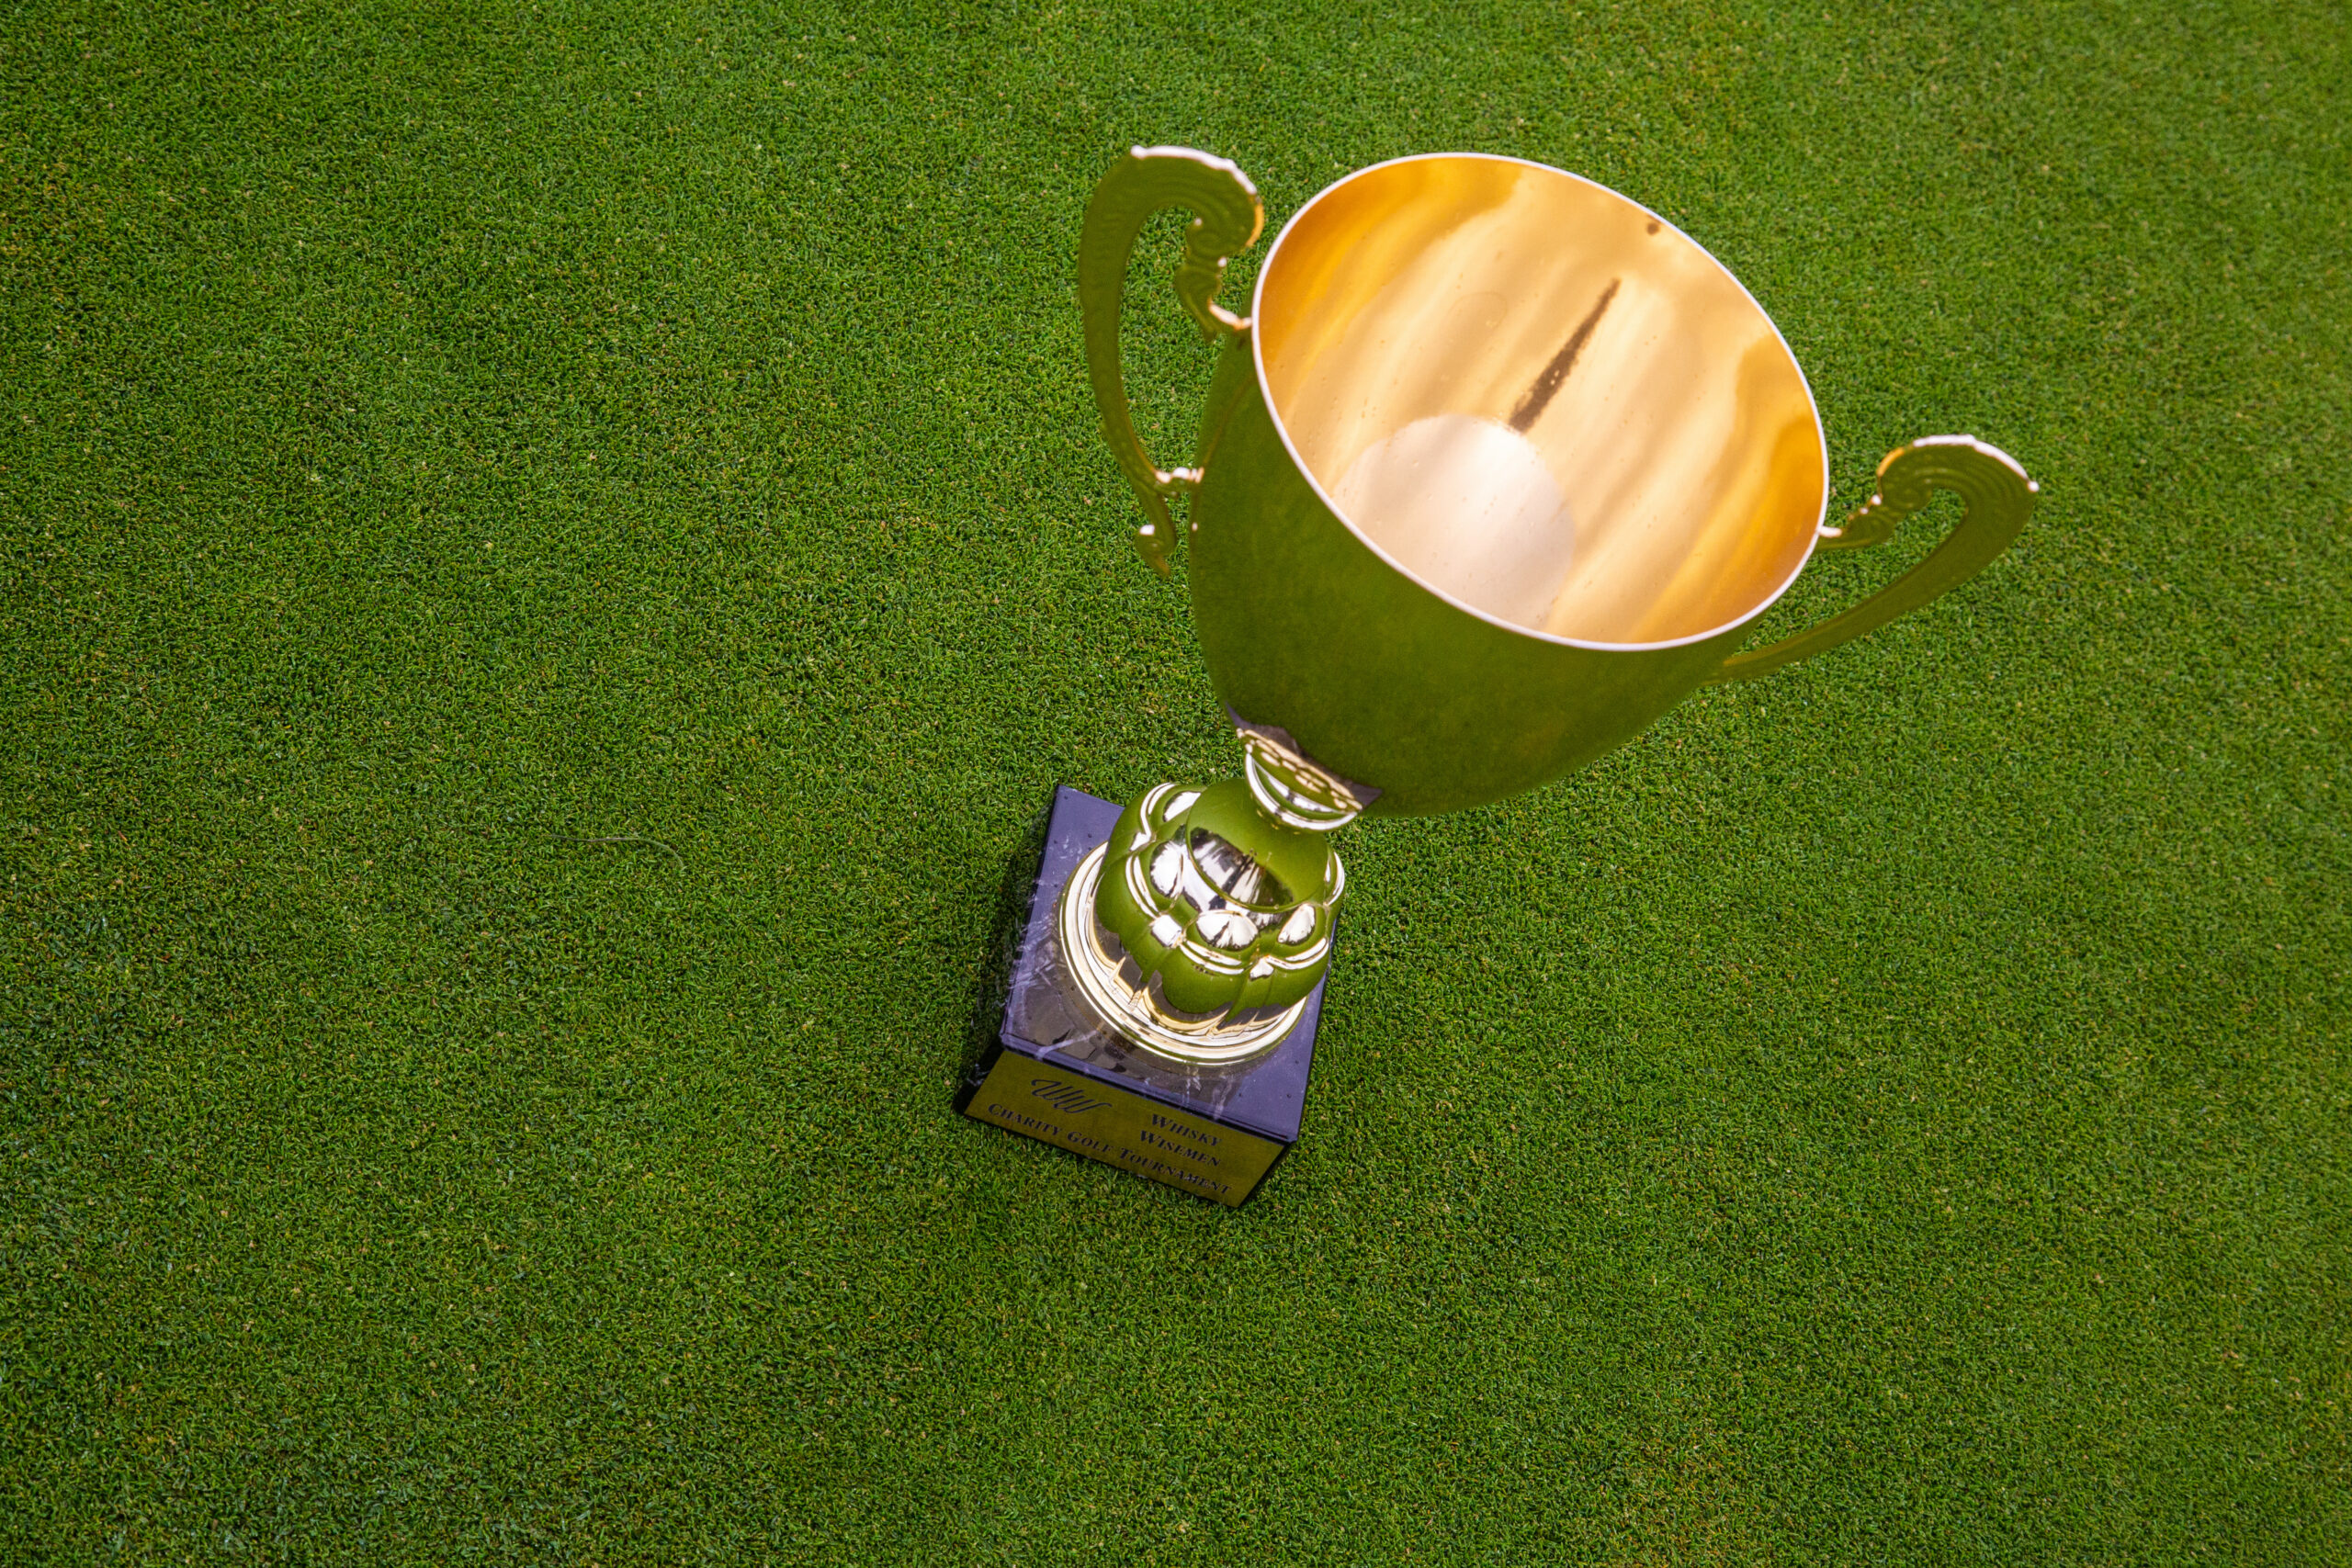 lesley brown, helen siwak, golf tournament, ecoluxluv, folioyvr, vancouver, bc, vancity, yvr